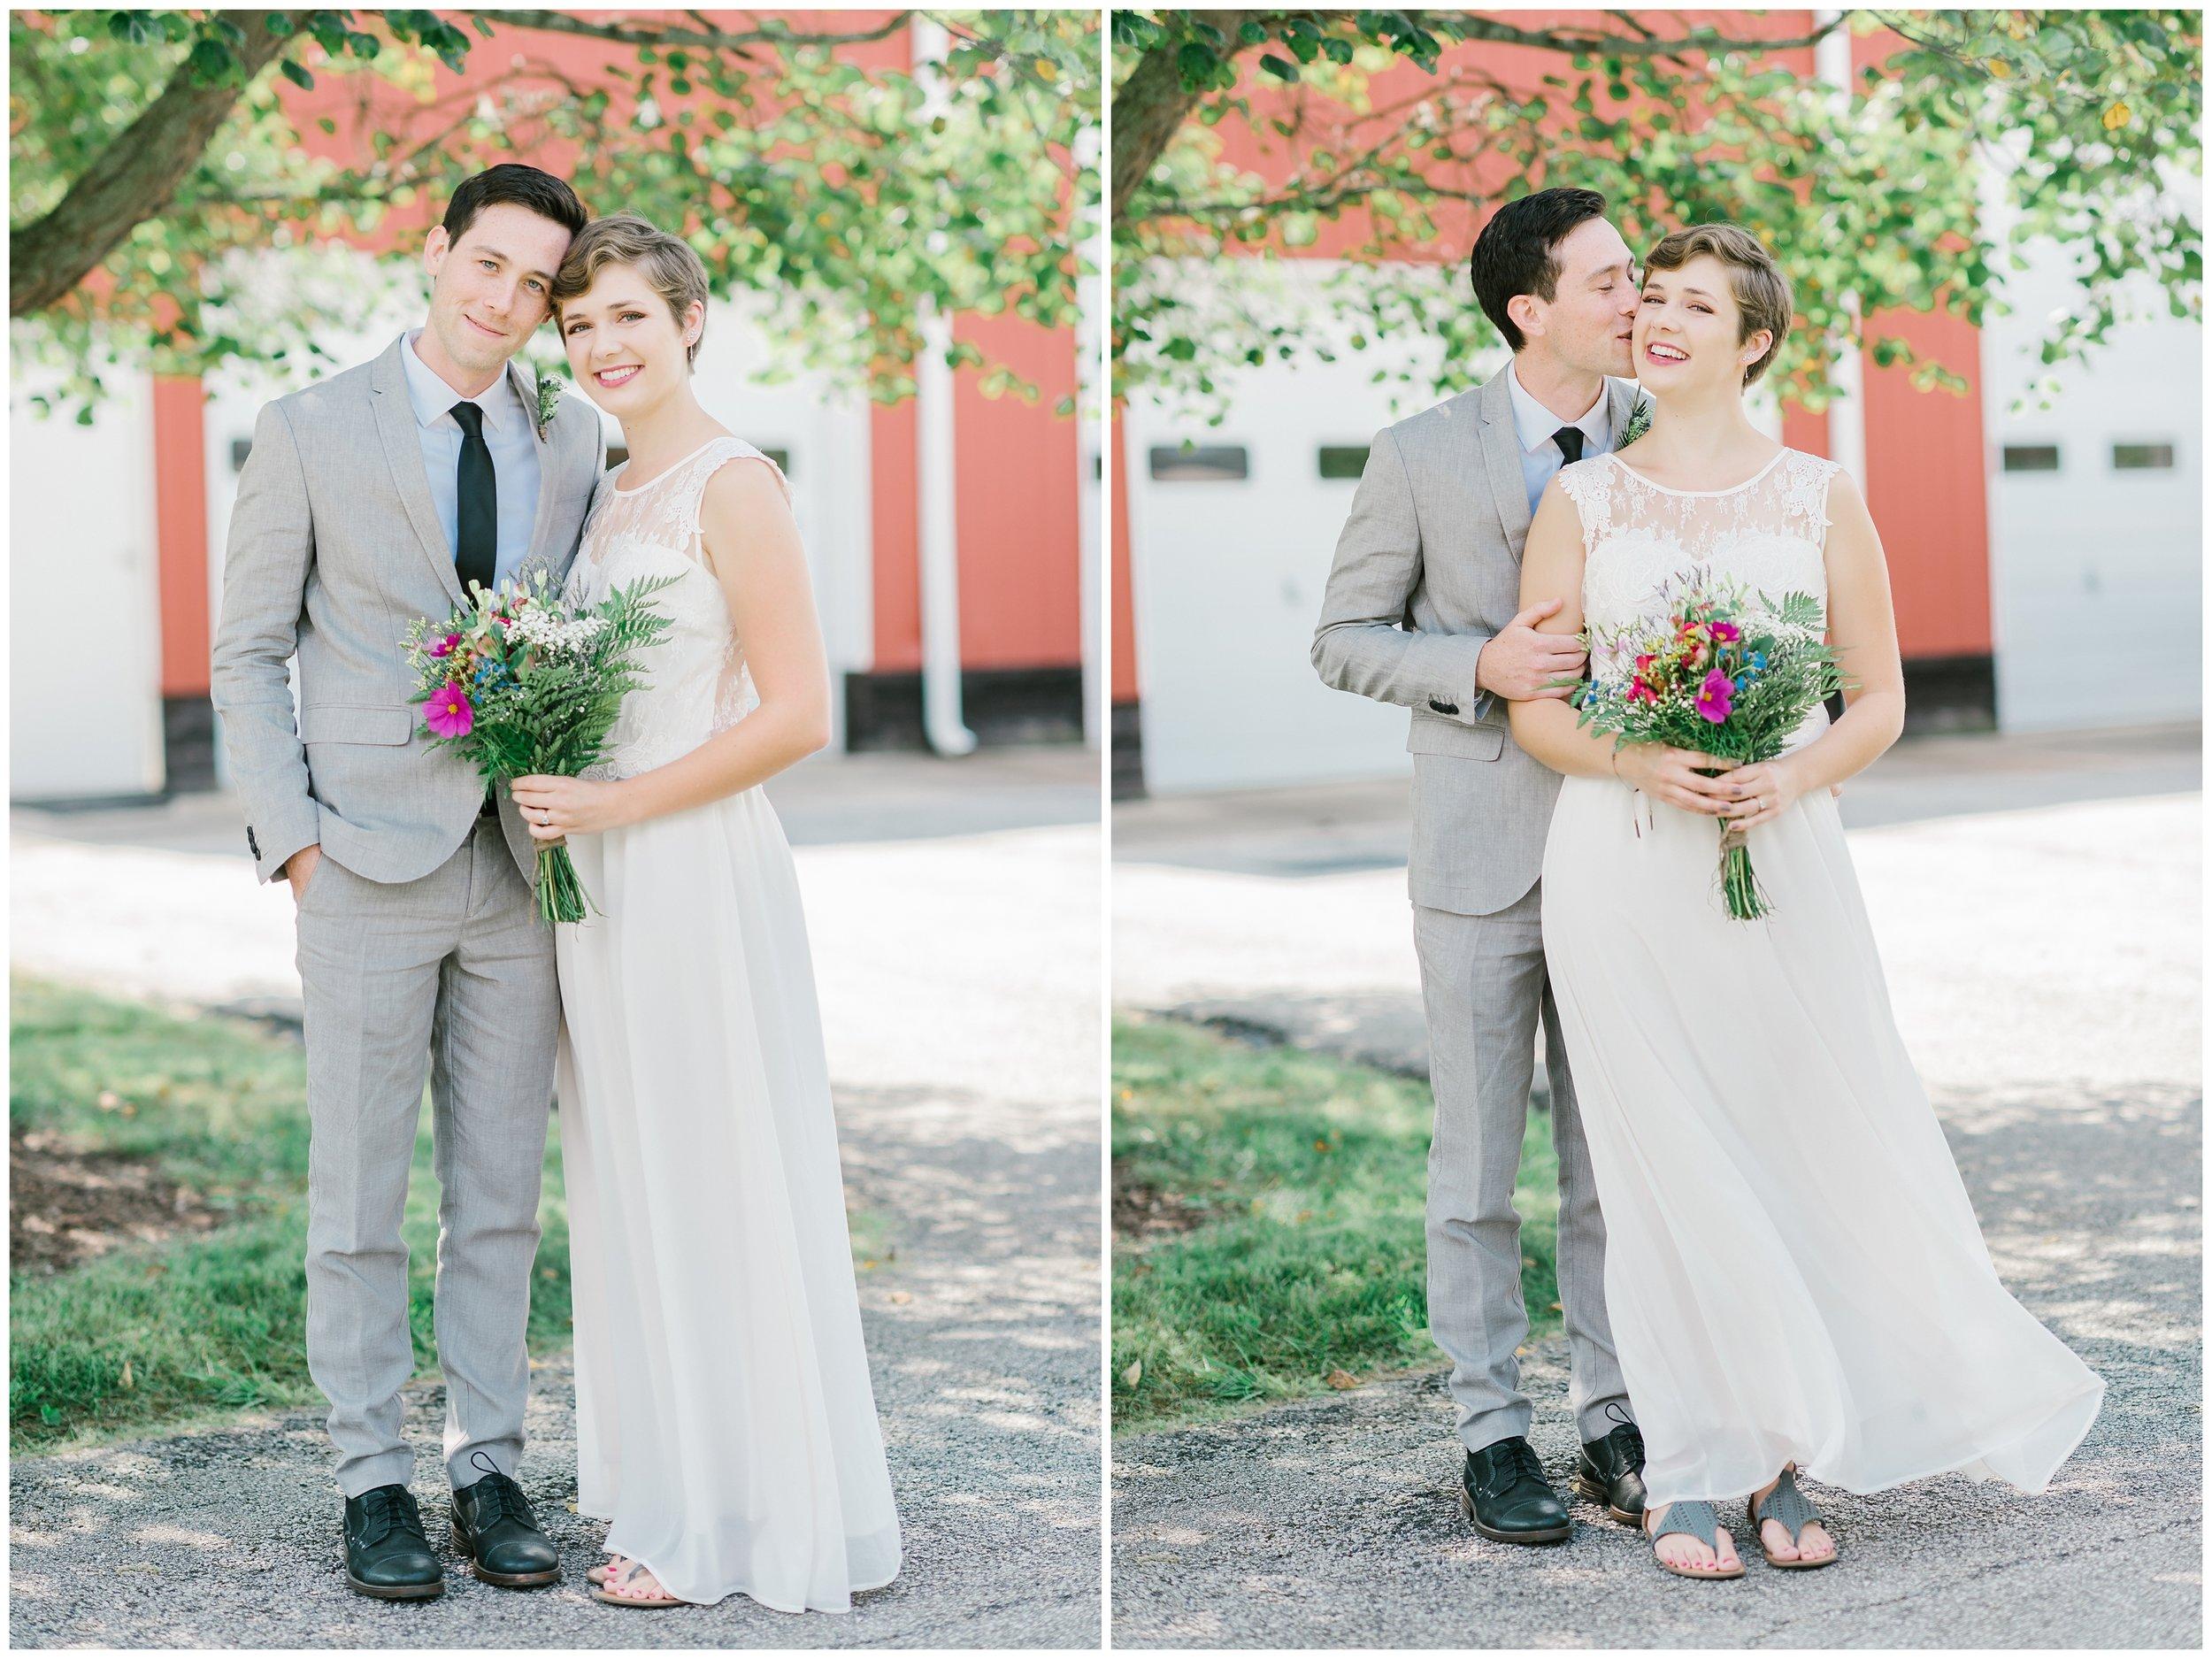 Rebecca_Shehorn_Photography_Indianapolis_Wedding_Photographer_7220.jpg